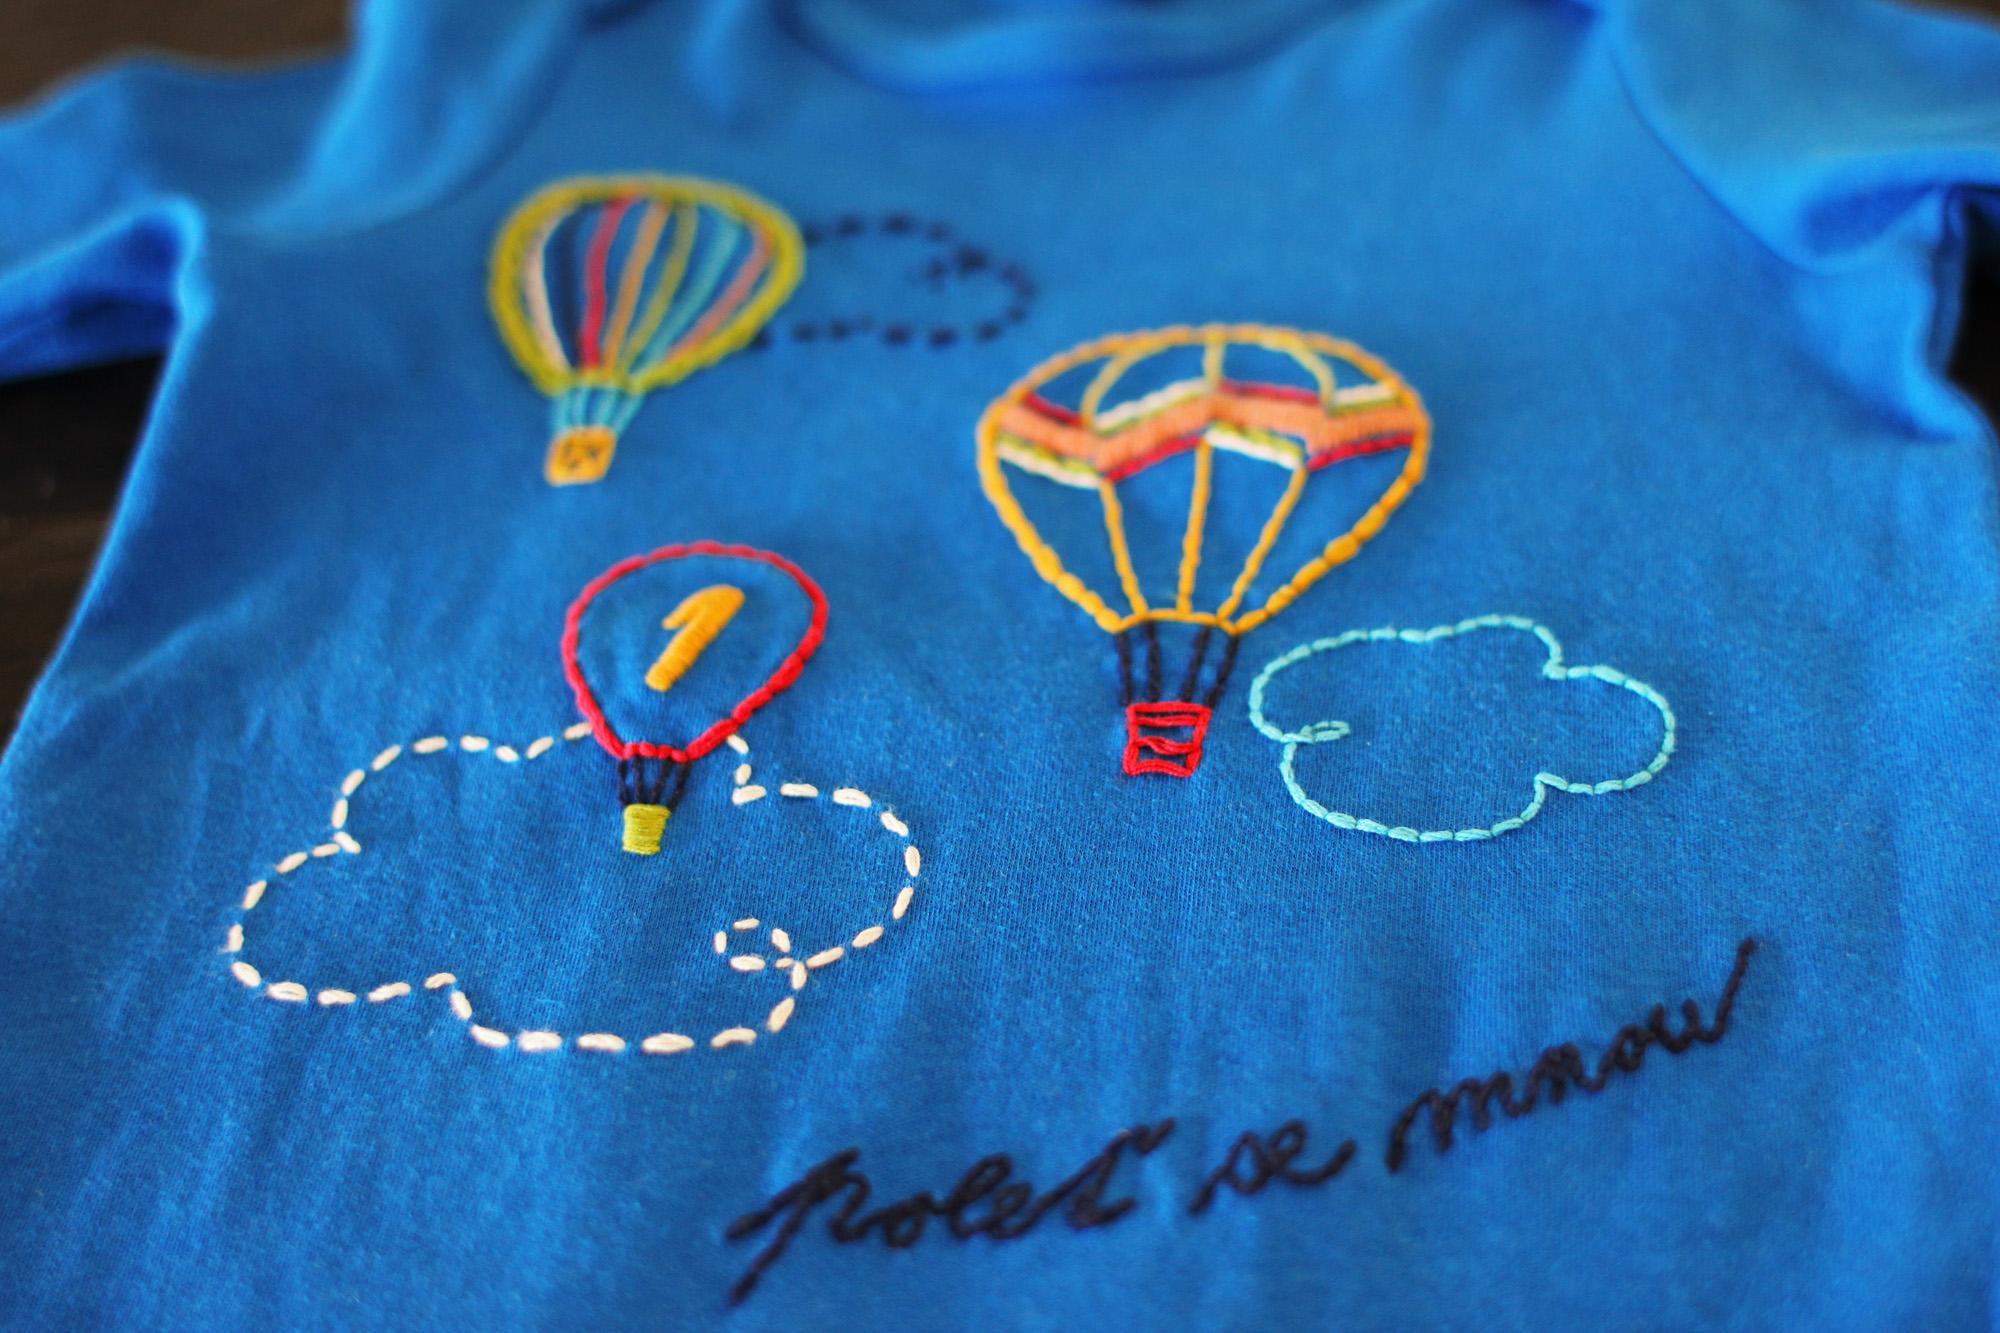 vyšívané balony detail